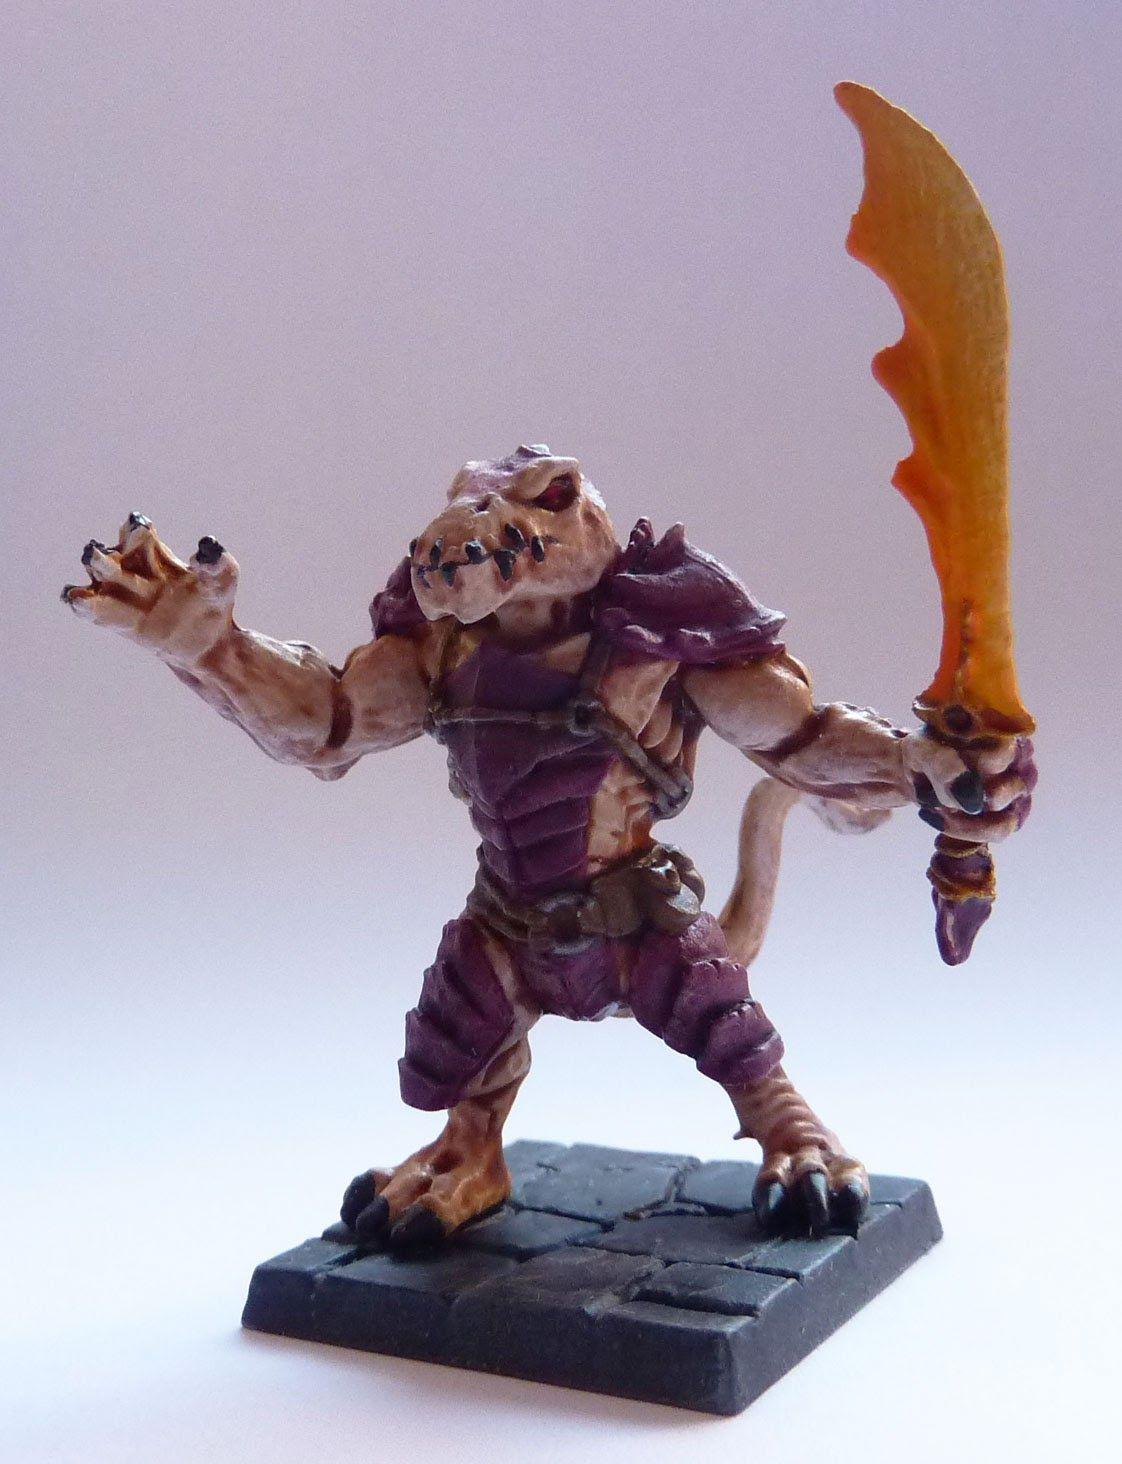 Hrrath - Salamander Fighter - Warlord of Galahir expansion